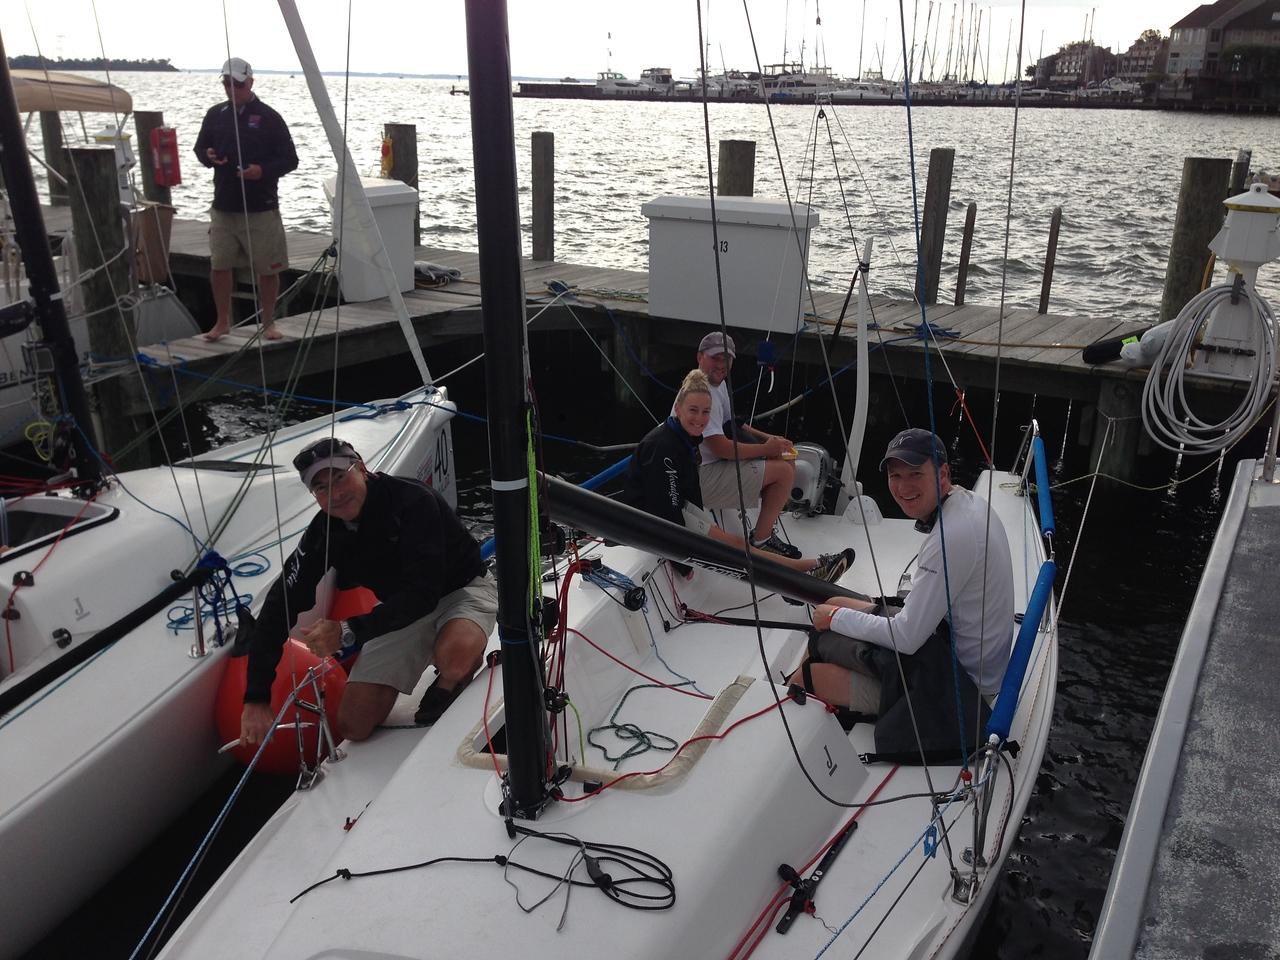 9/27/2013 J/70 NAC - Nostalgia - Blake Kimbrough, Lud Kimbrough, Julia, Lee